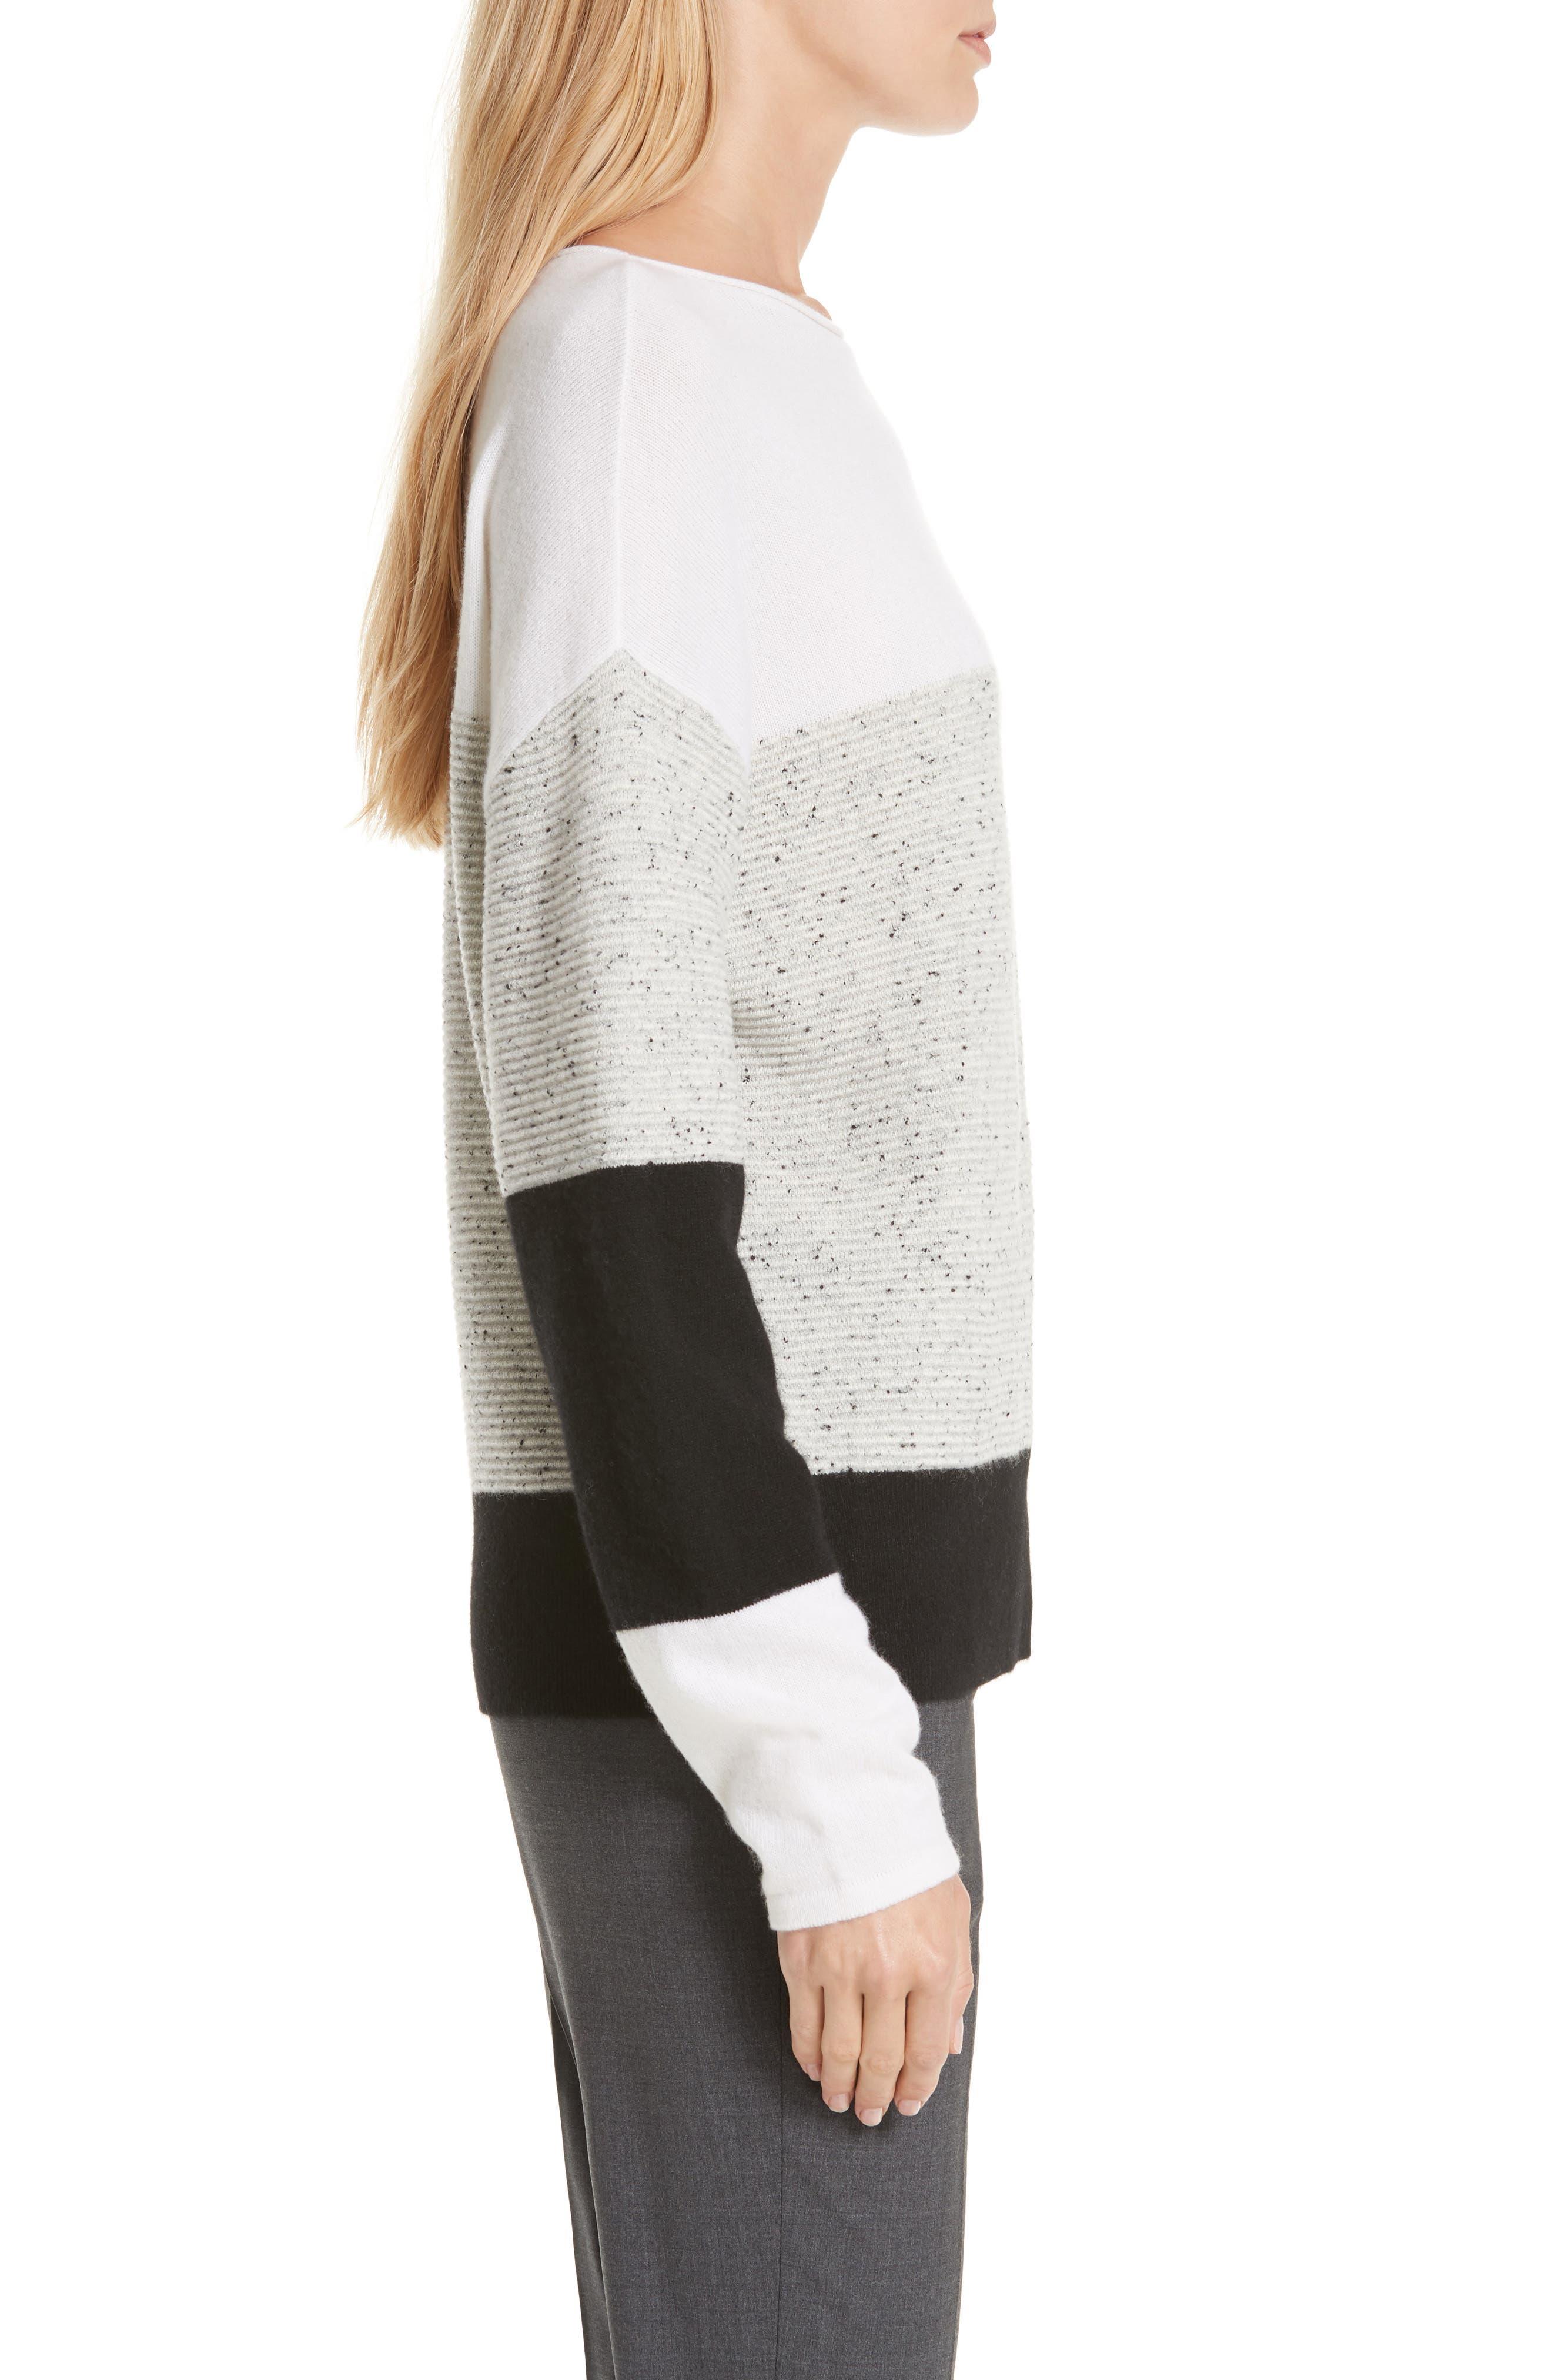 Colorblock Cashmere Sweater,                             Alternate thumbnail 3, color,                             IVORY SOFT MULTI COLOR BLOCK